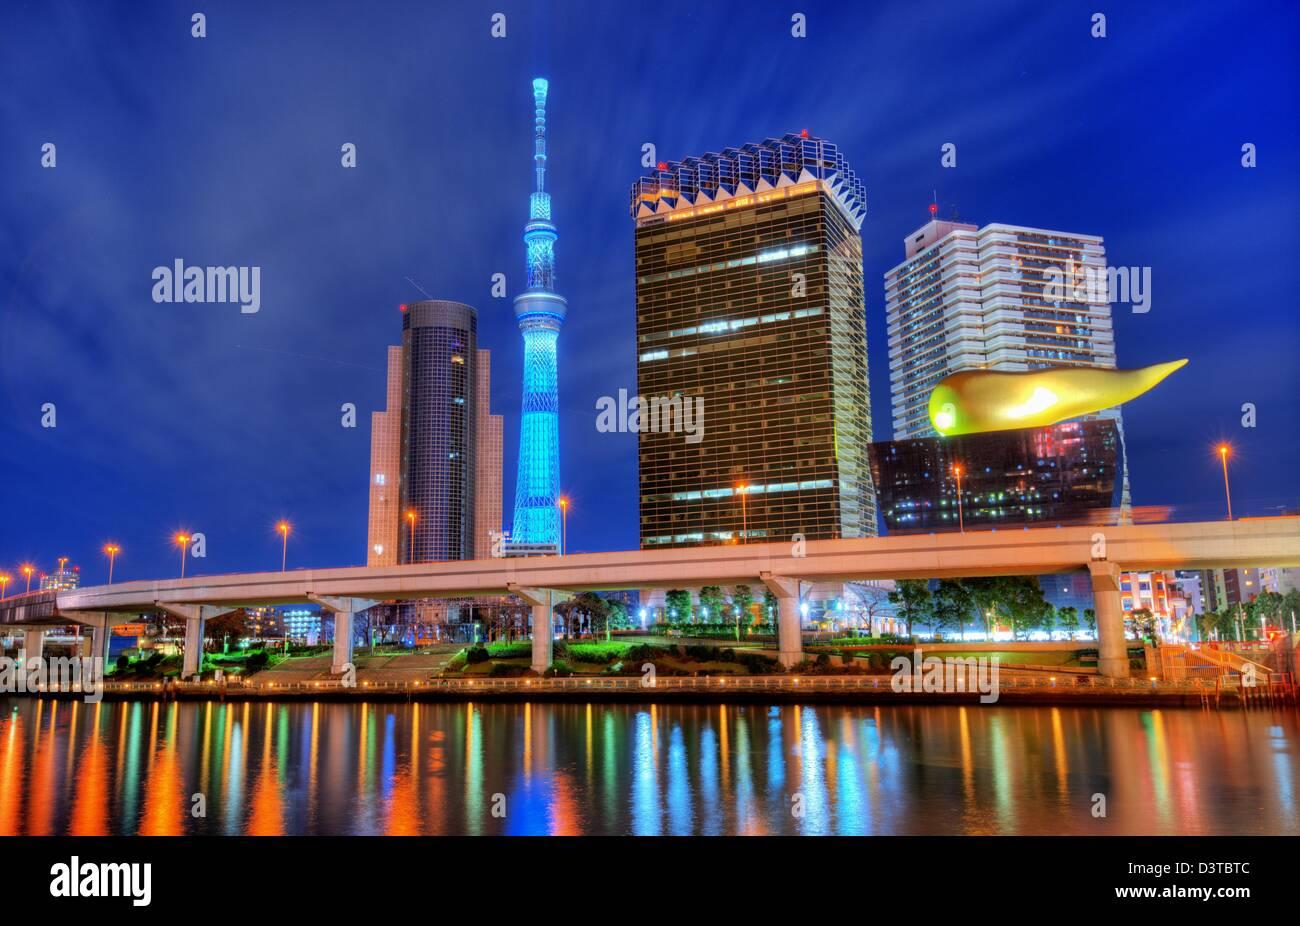 Landmark buildings line the Sumida River at Asakusa in Tokyo, Japan. - Stock Image